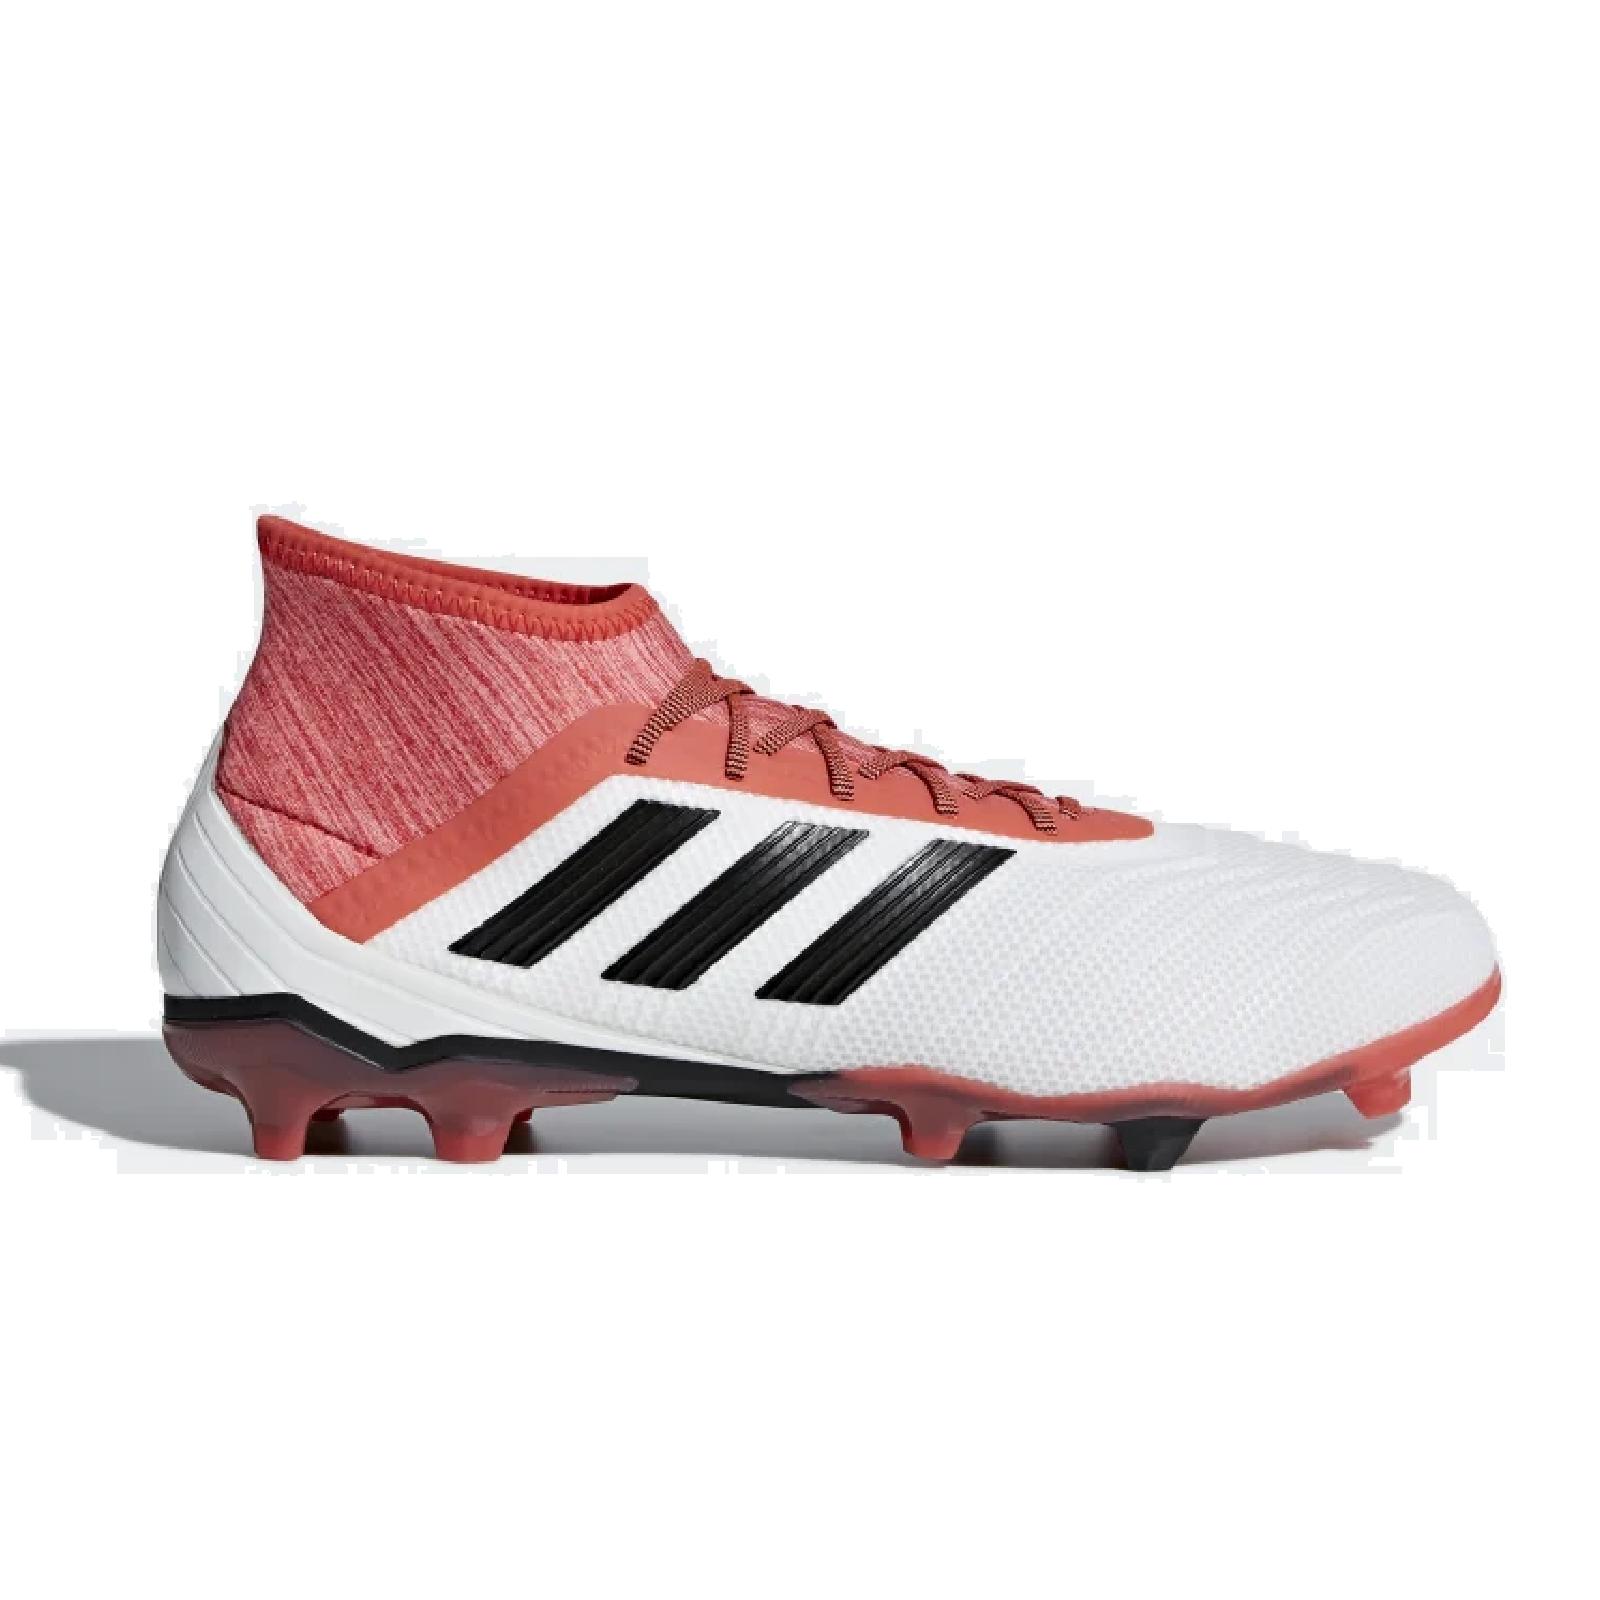 Adidas Predator 18 2 Fg Fussballschuhe Weiss Schwarz Rot Cm7666